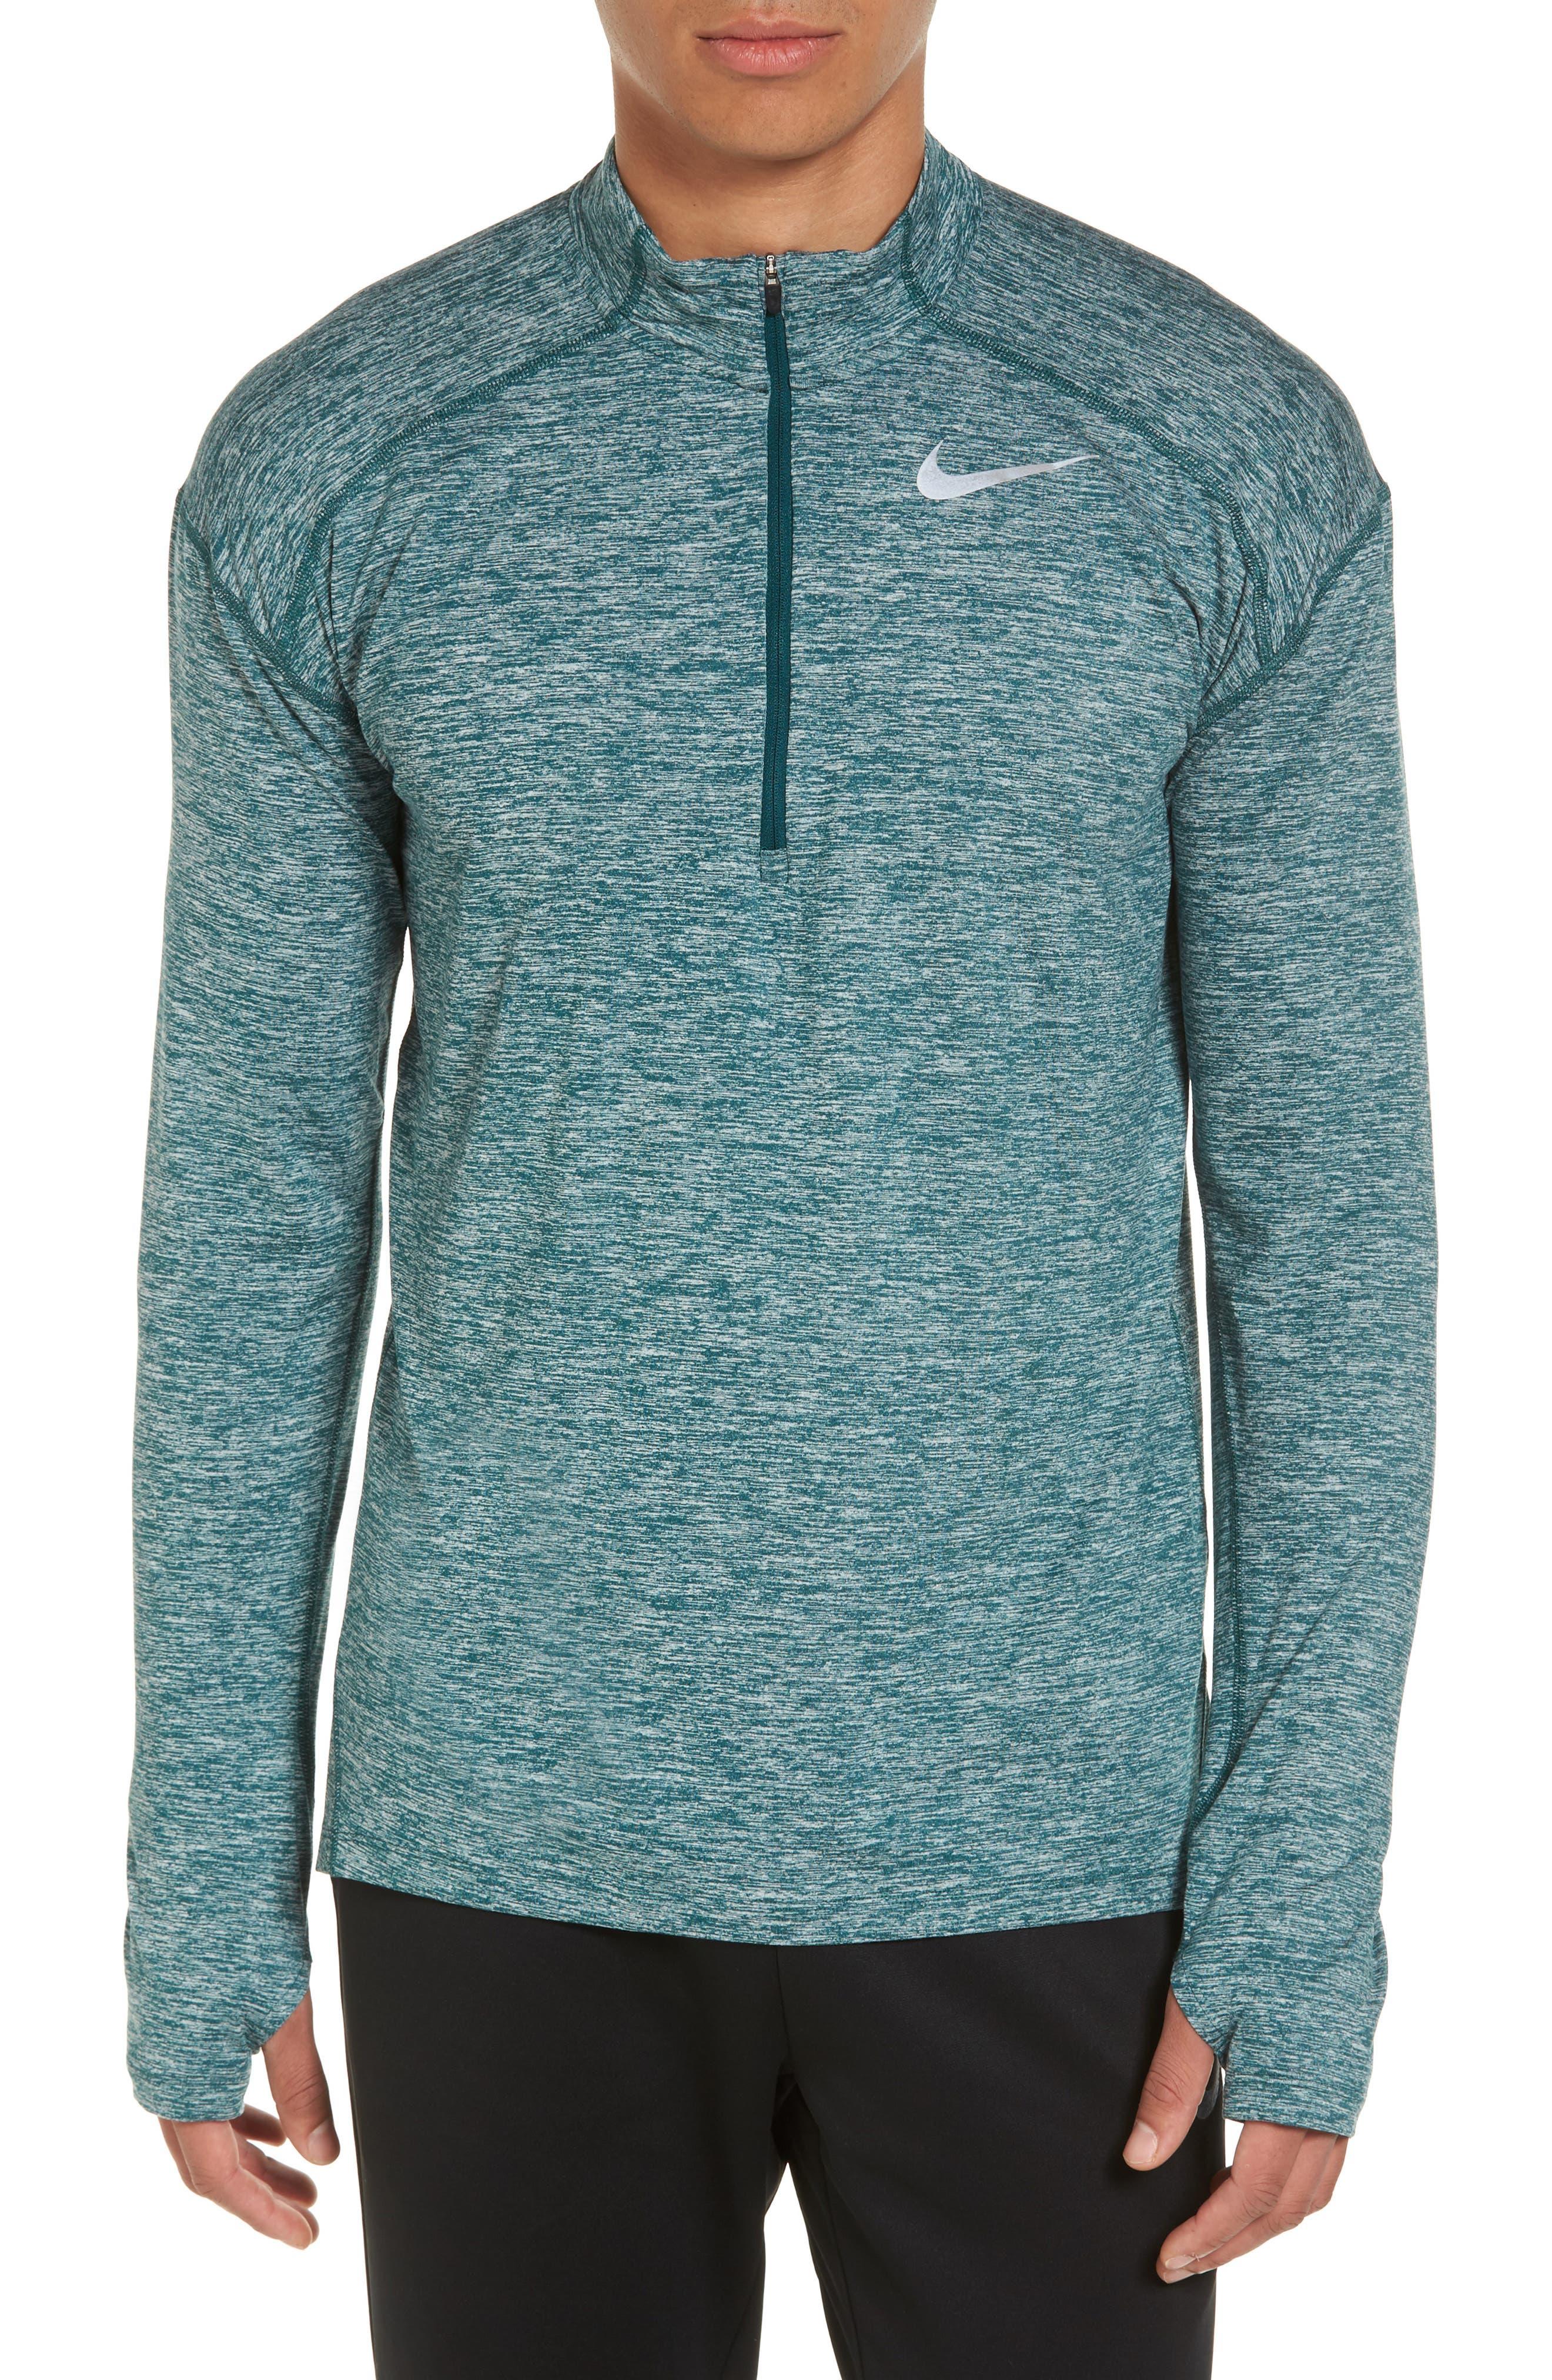 Main Image - Nike Dry Element Running Top